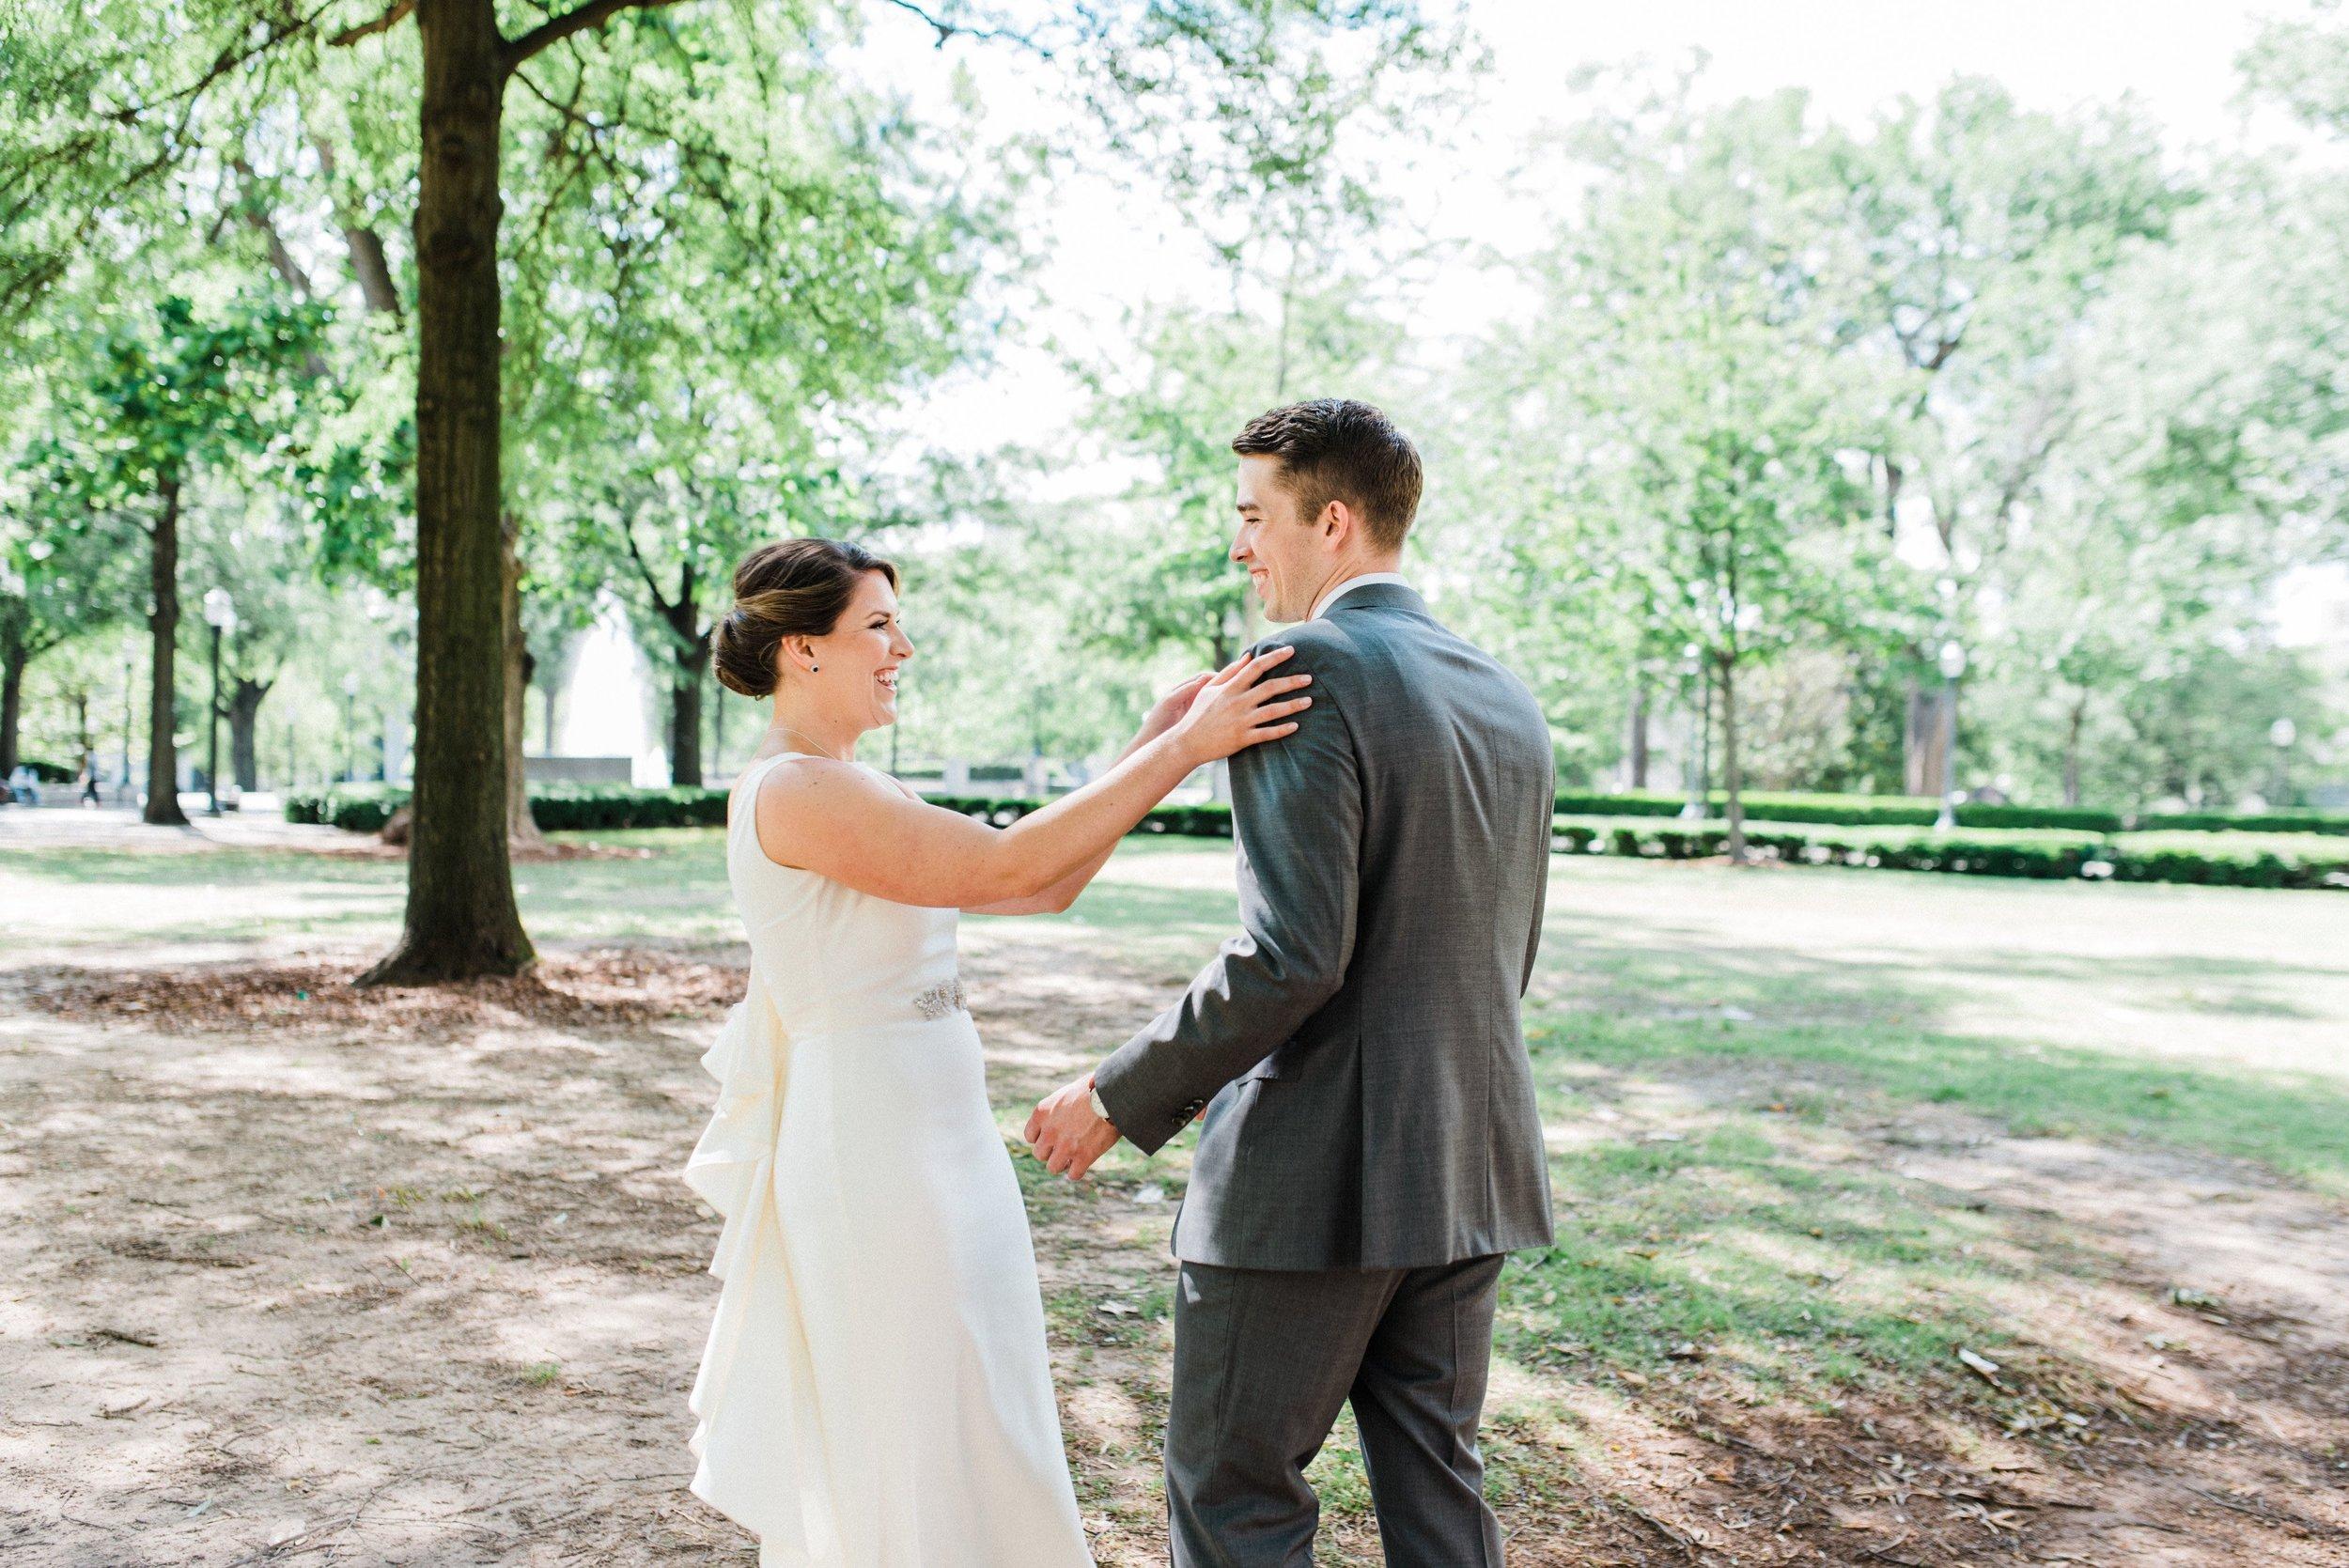 Stephen and Michelle-Stephen and Michelle-0003.jpg